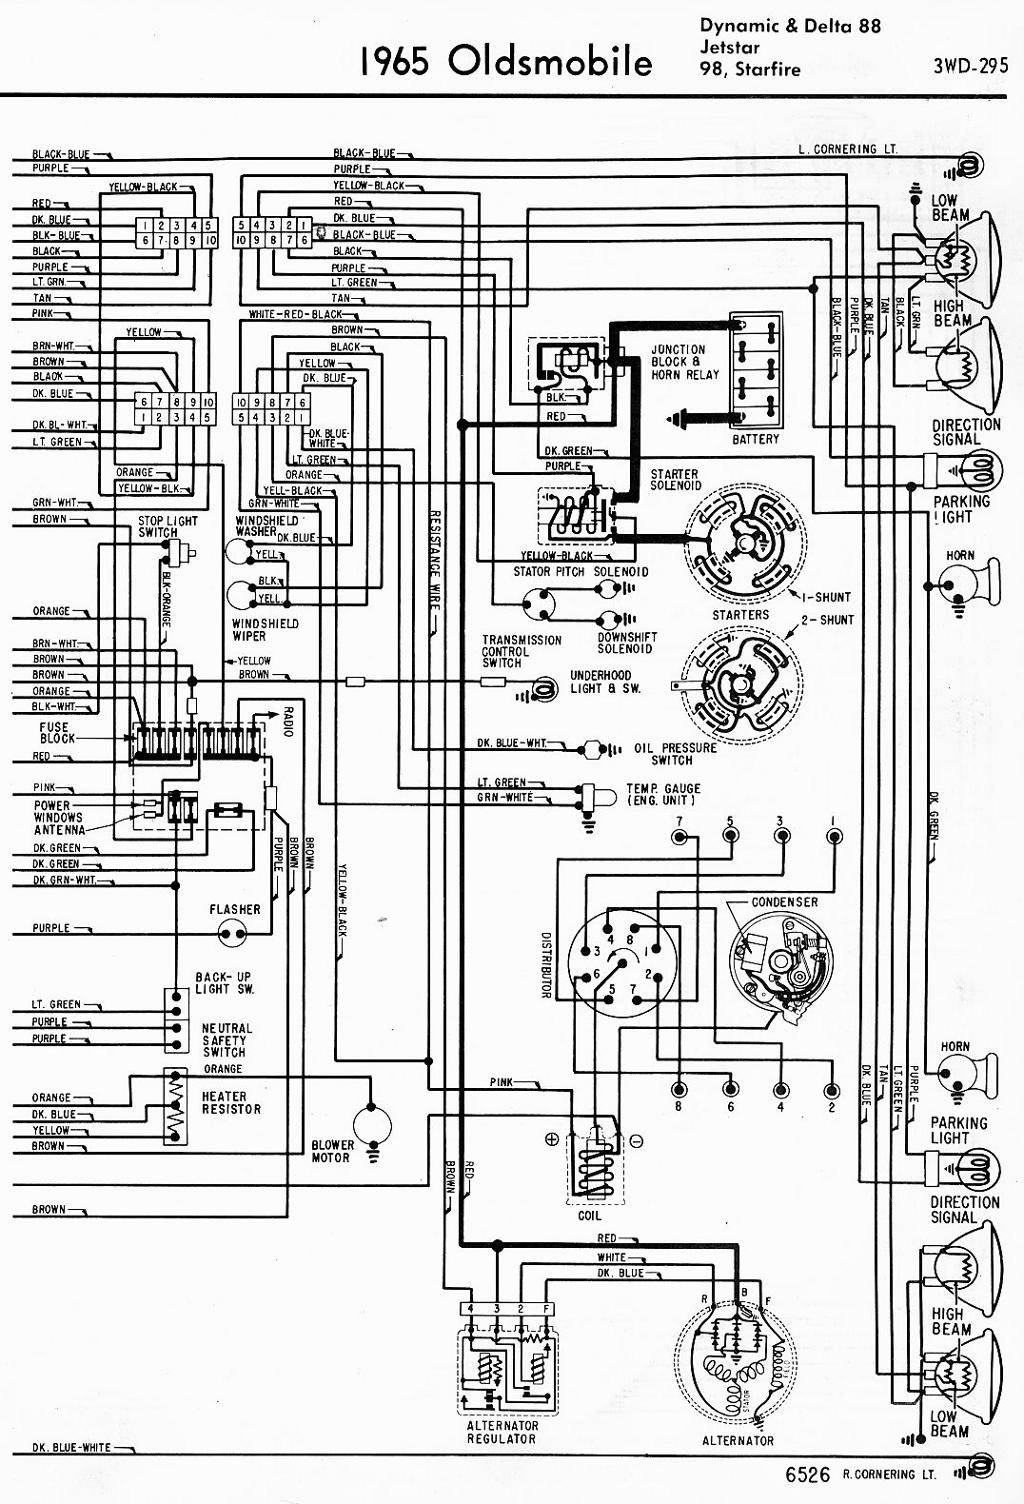 1959 Oldsmobile Wiring Diagram Guide And Troubleshooting Of Alero Radio 1965 98 Diagrams Schema Rh 42 Valdeig Media De 1995 1998